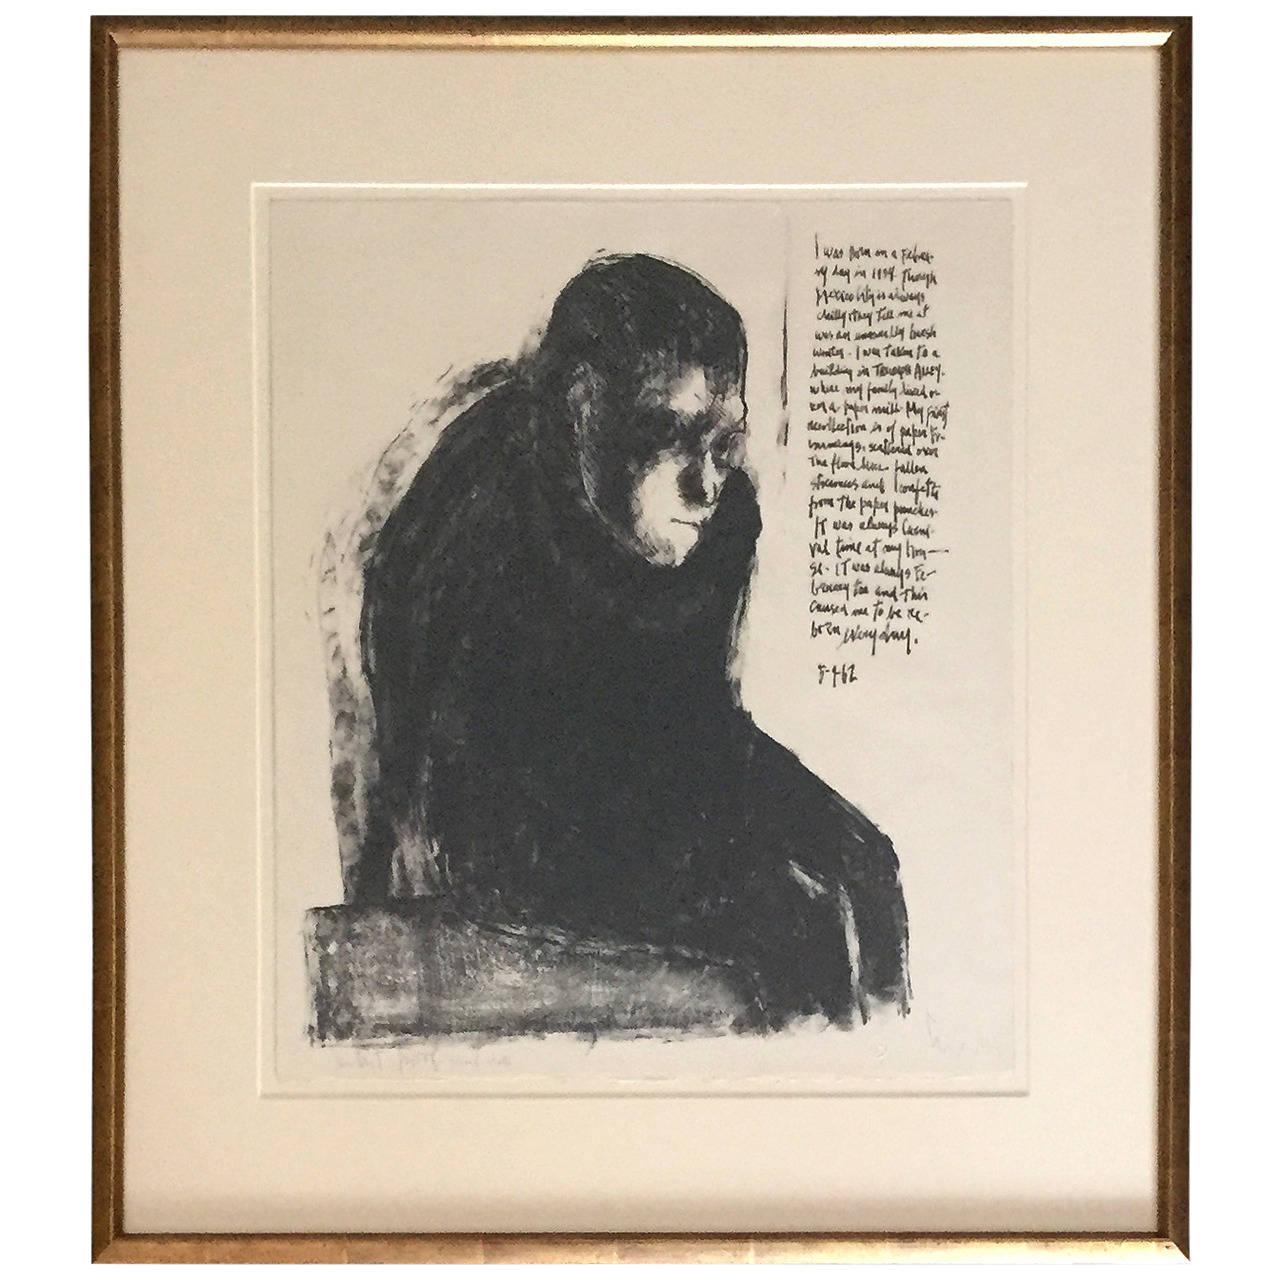 Framed Lithograph by Mexican Artist José Luis Cuevas